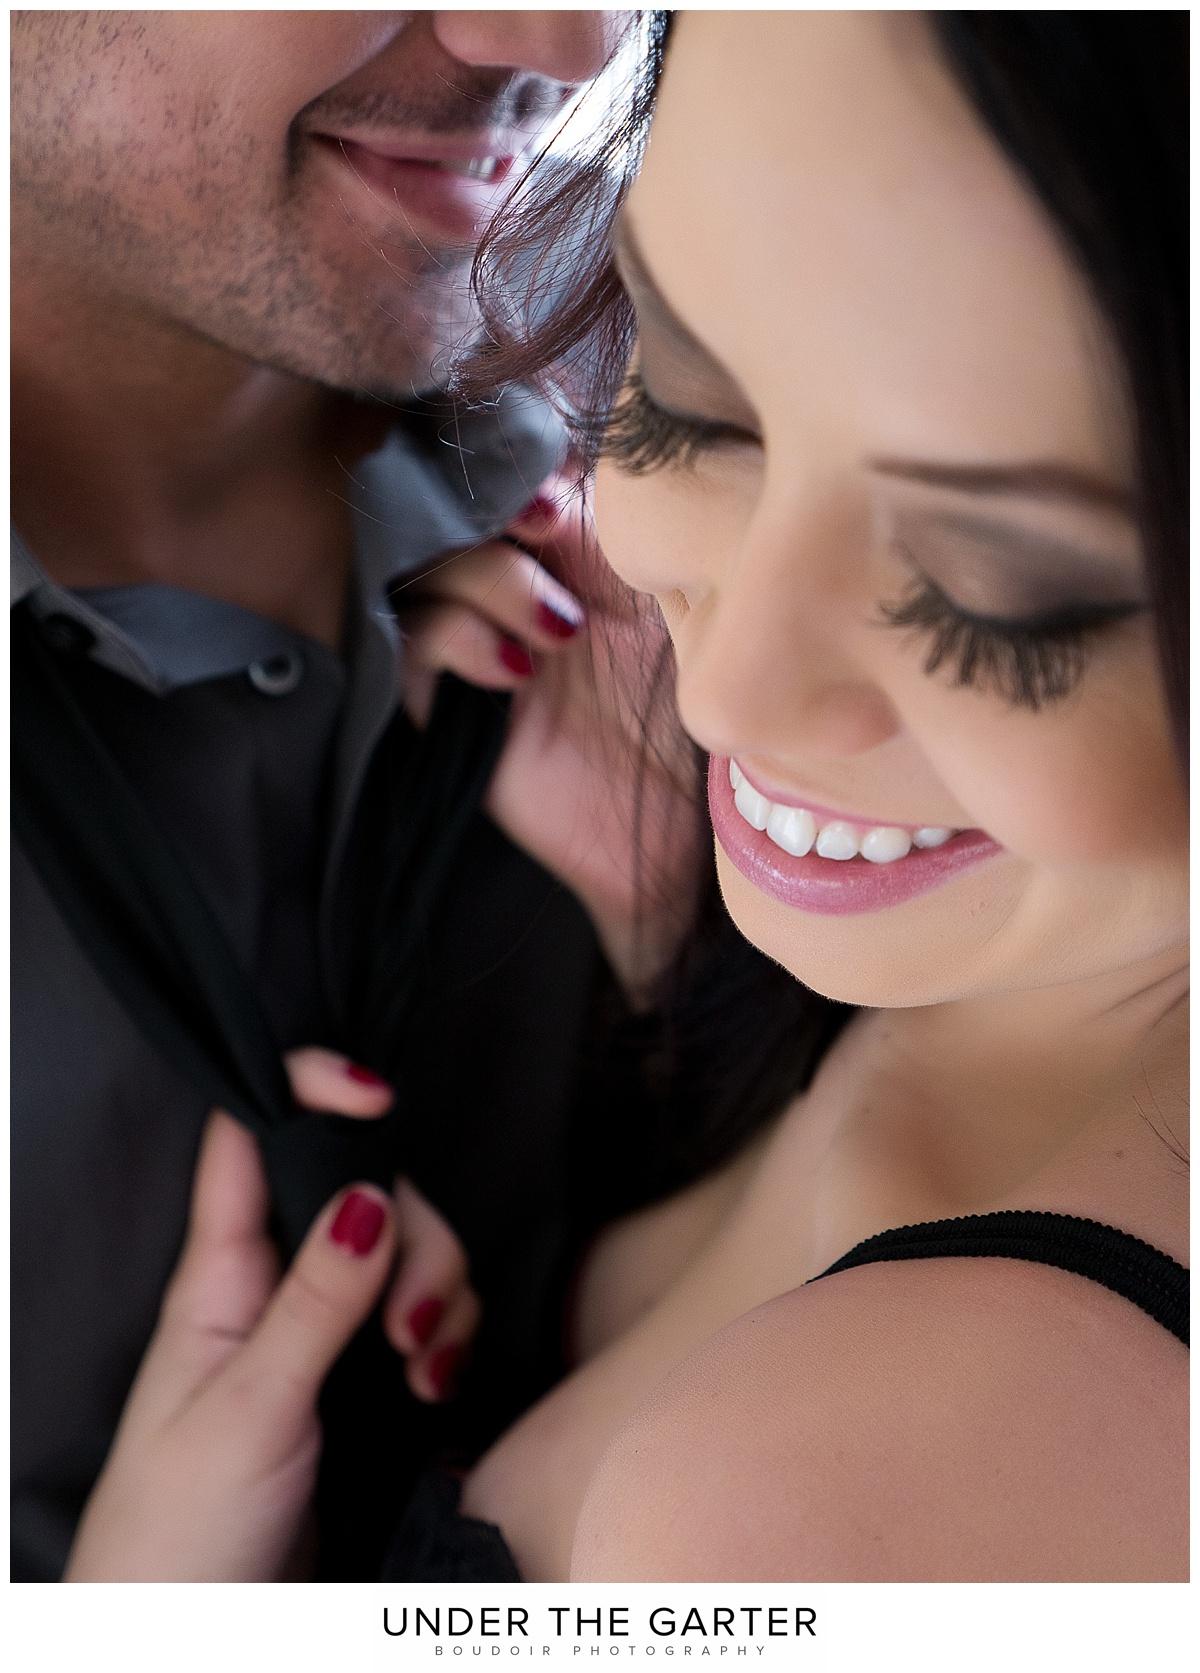 couples boudoir photography denver tie laughing.jpg